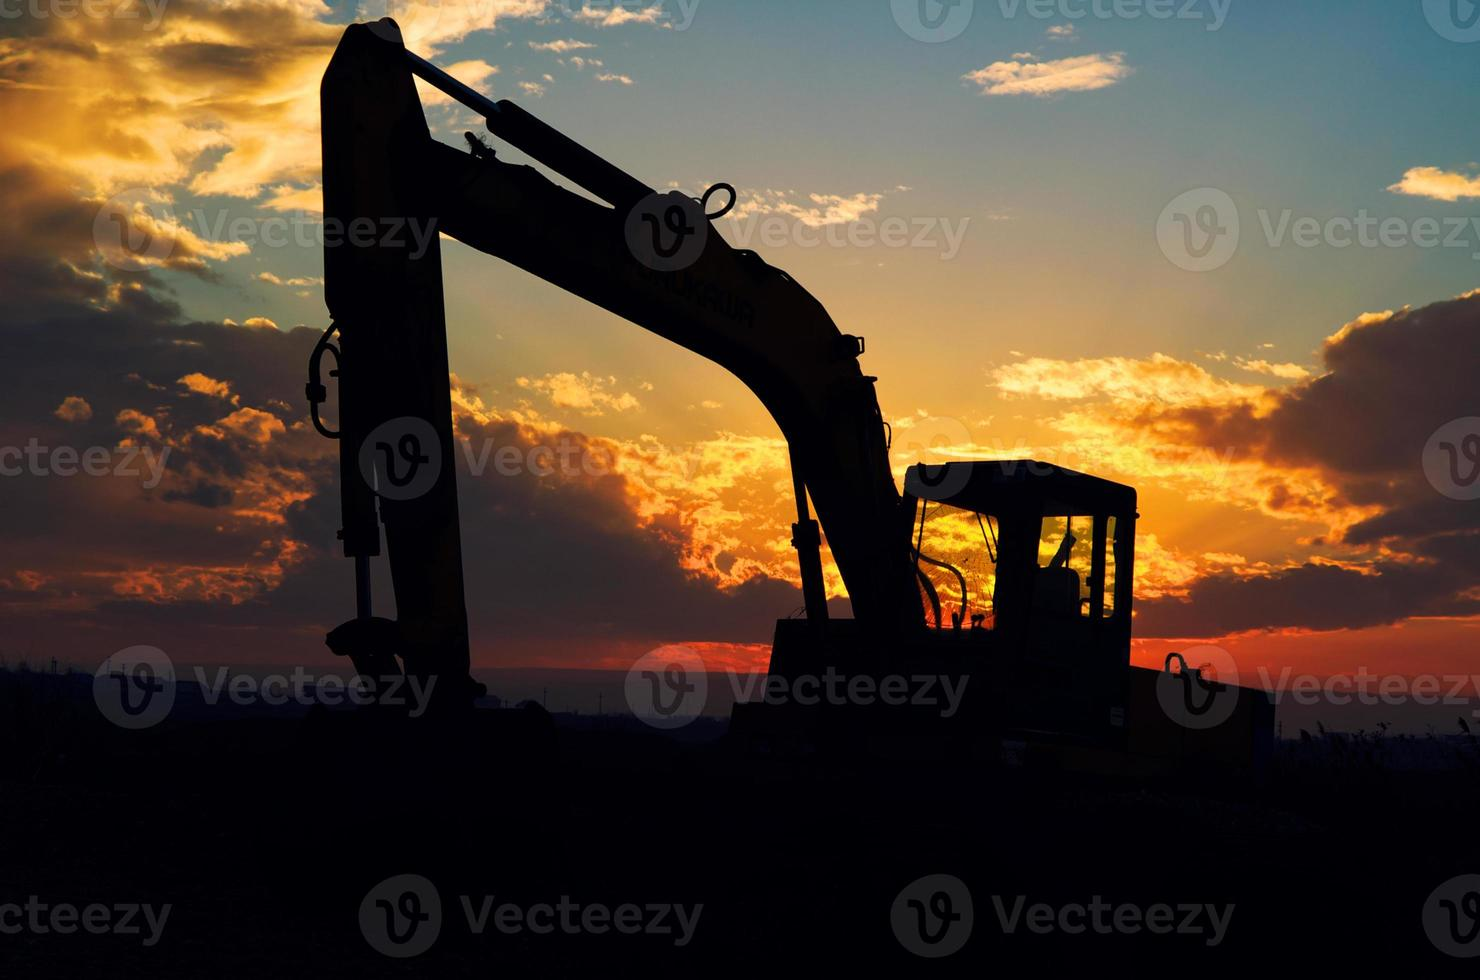 Bagger Silhouette im Sonnenuntergang Licht. foto